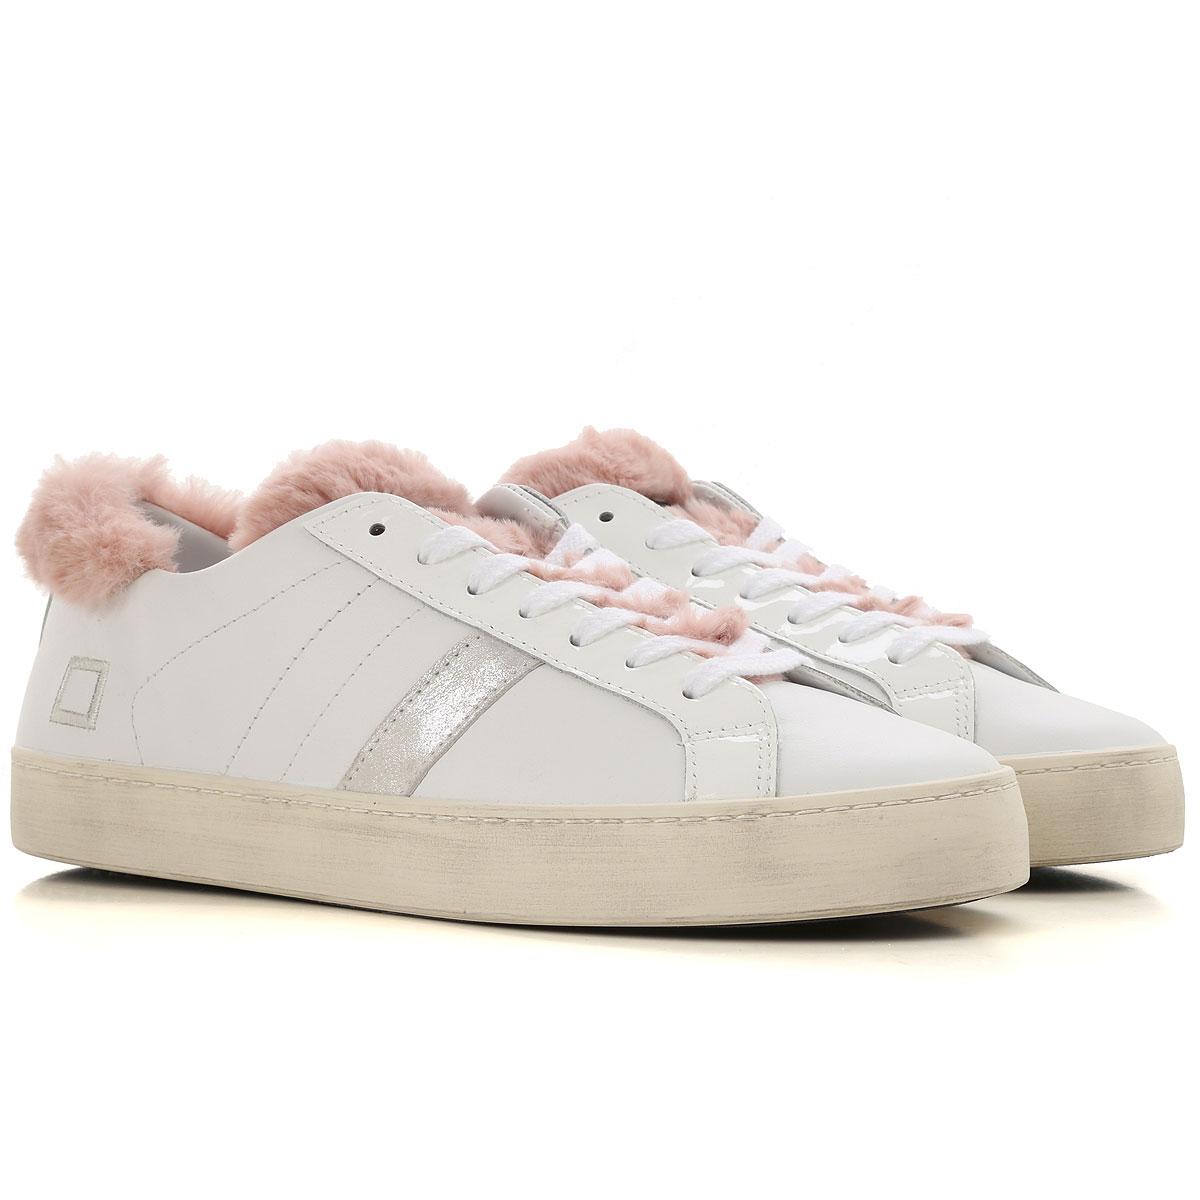 D.A.T.E. Sneakers for Women, White, Leather, 2019, US 6 5 - UK 4 - EU 37 - JP 23 US 7 5 - UK 5 - EU 38 - JP 24